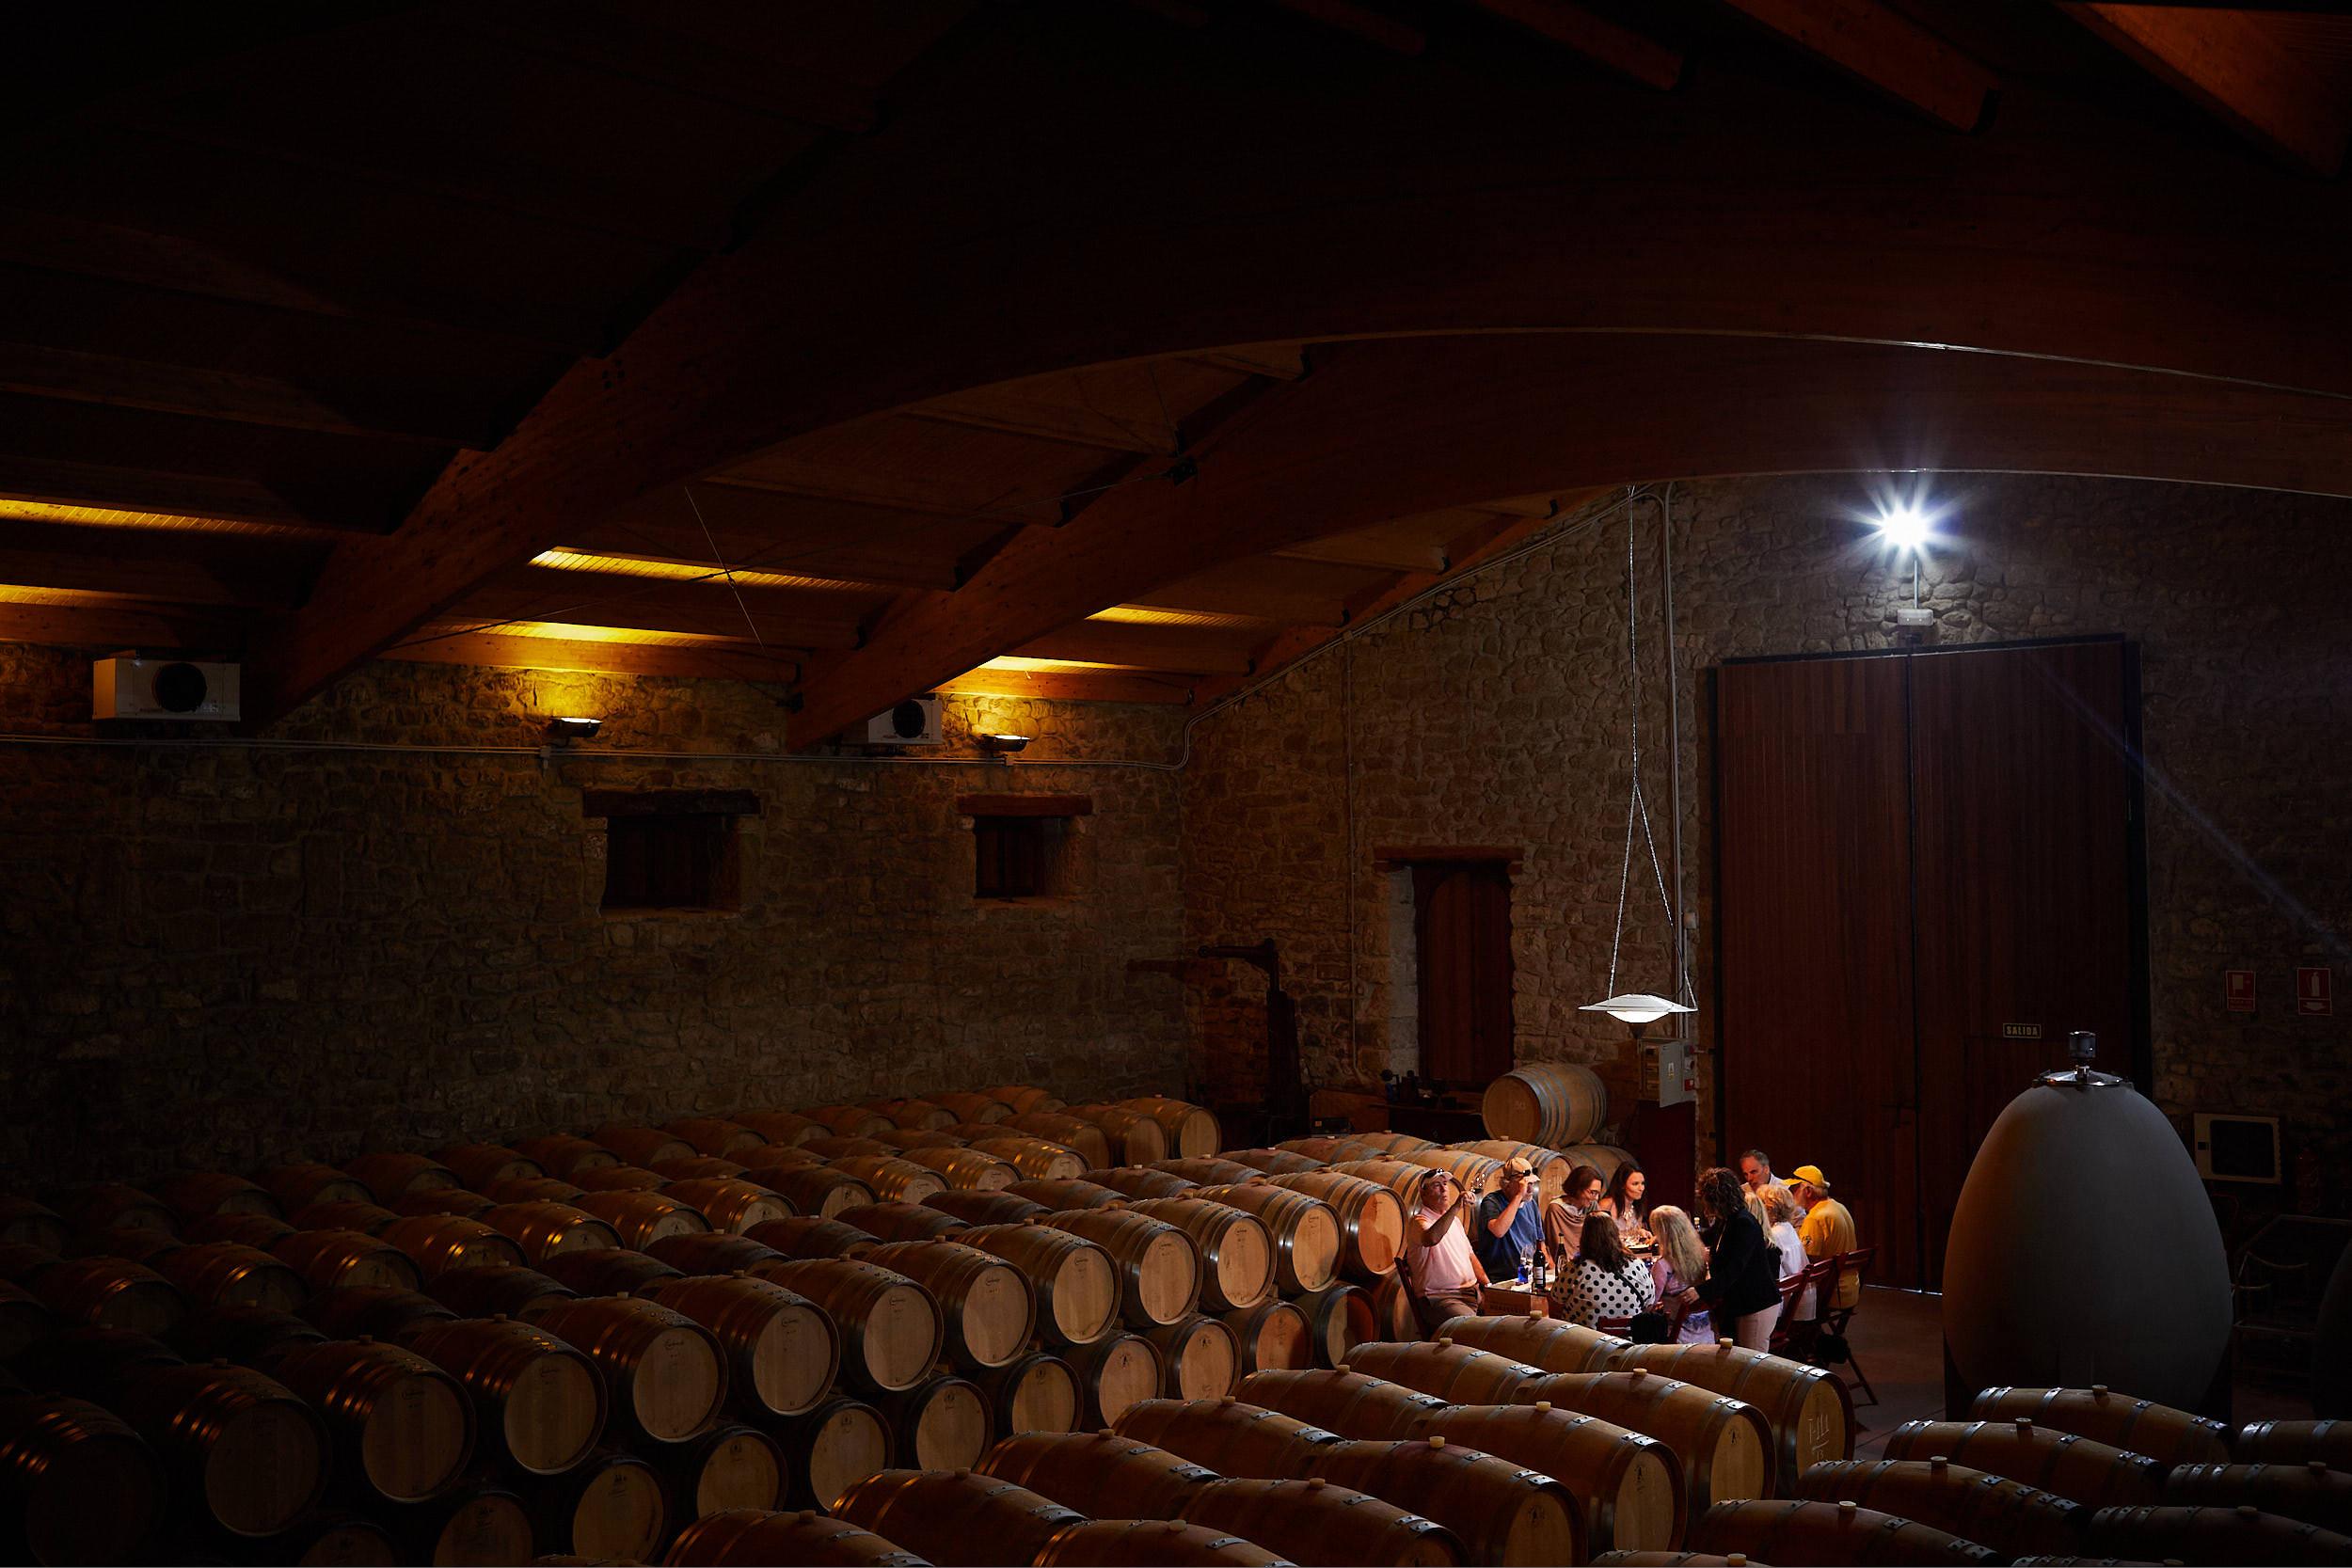 1809Commercial-professional-wine-photography-la-rioja-spain-James-Sturcke_0039.jpg